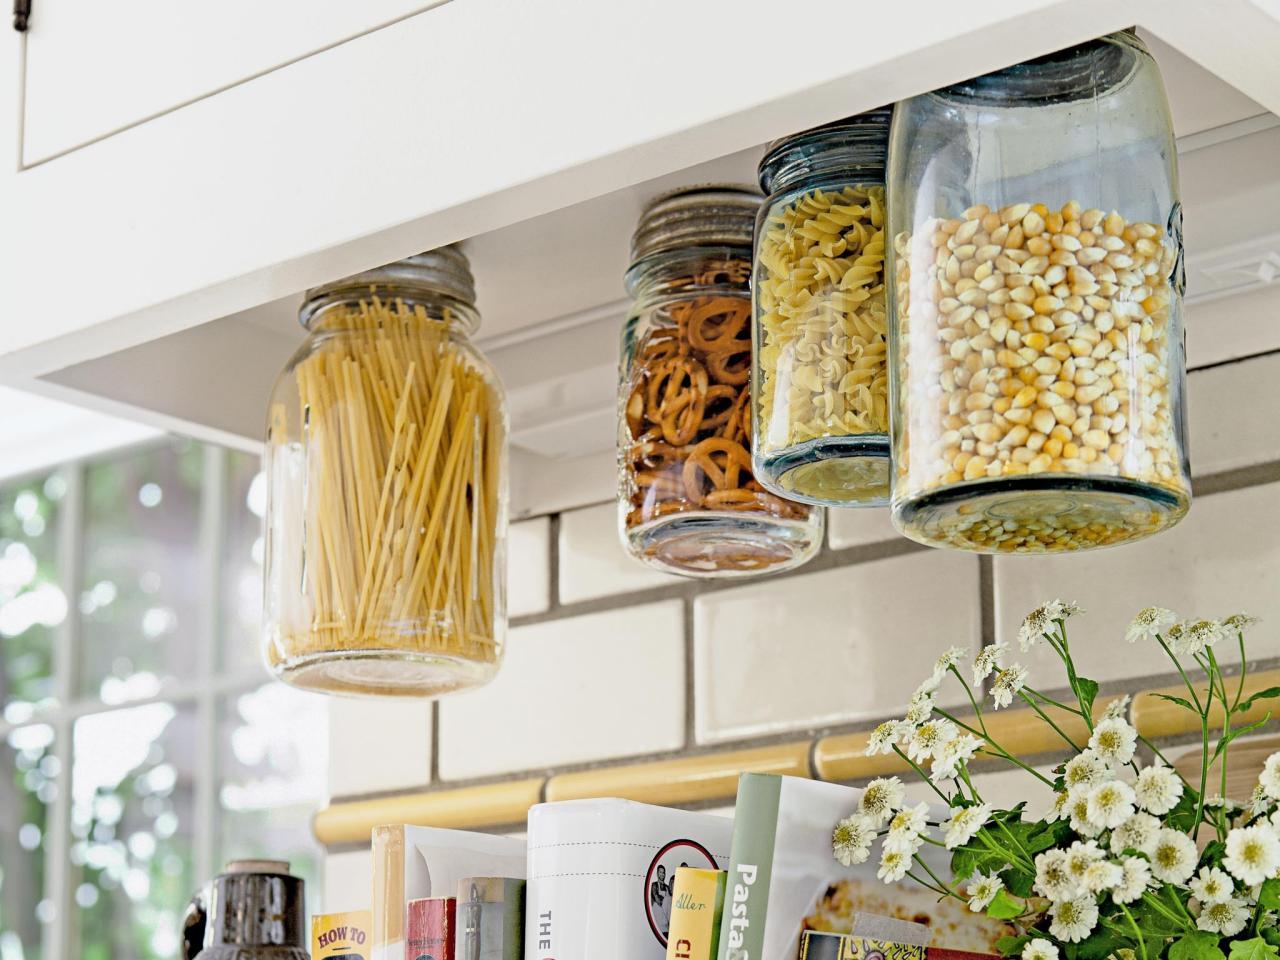 1. Mason Jar Food Storage